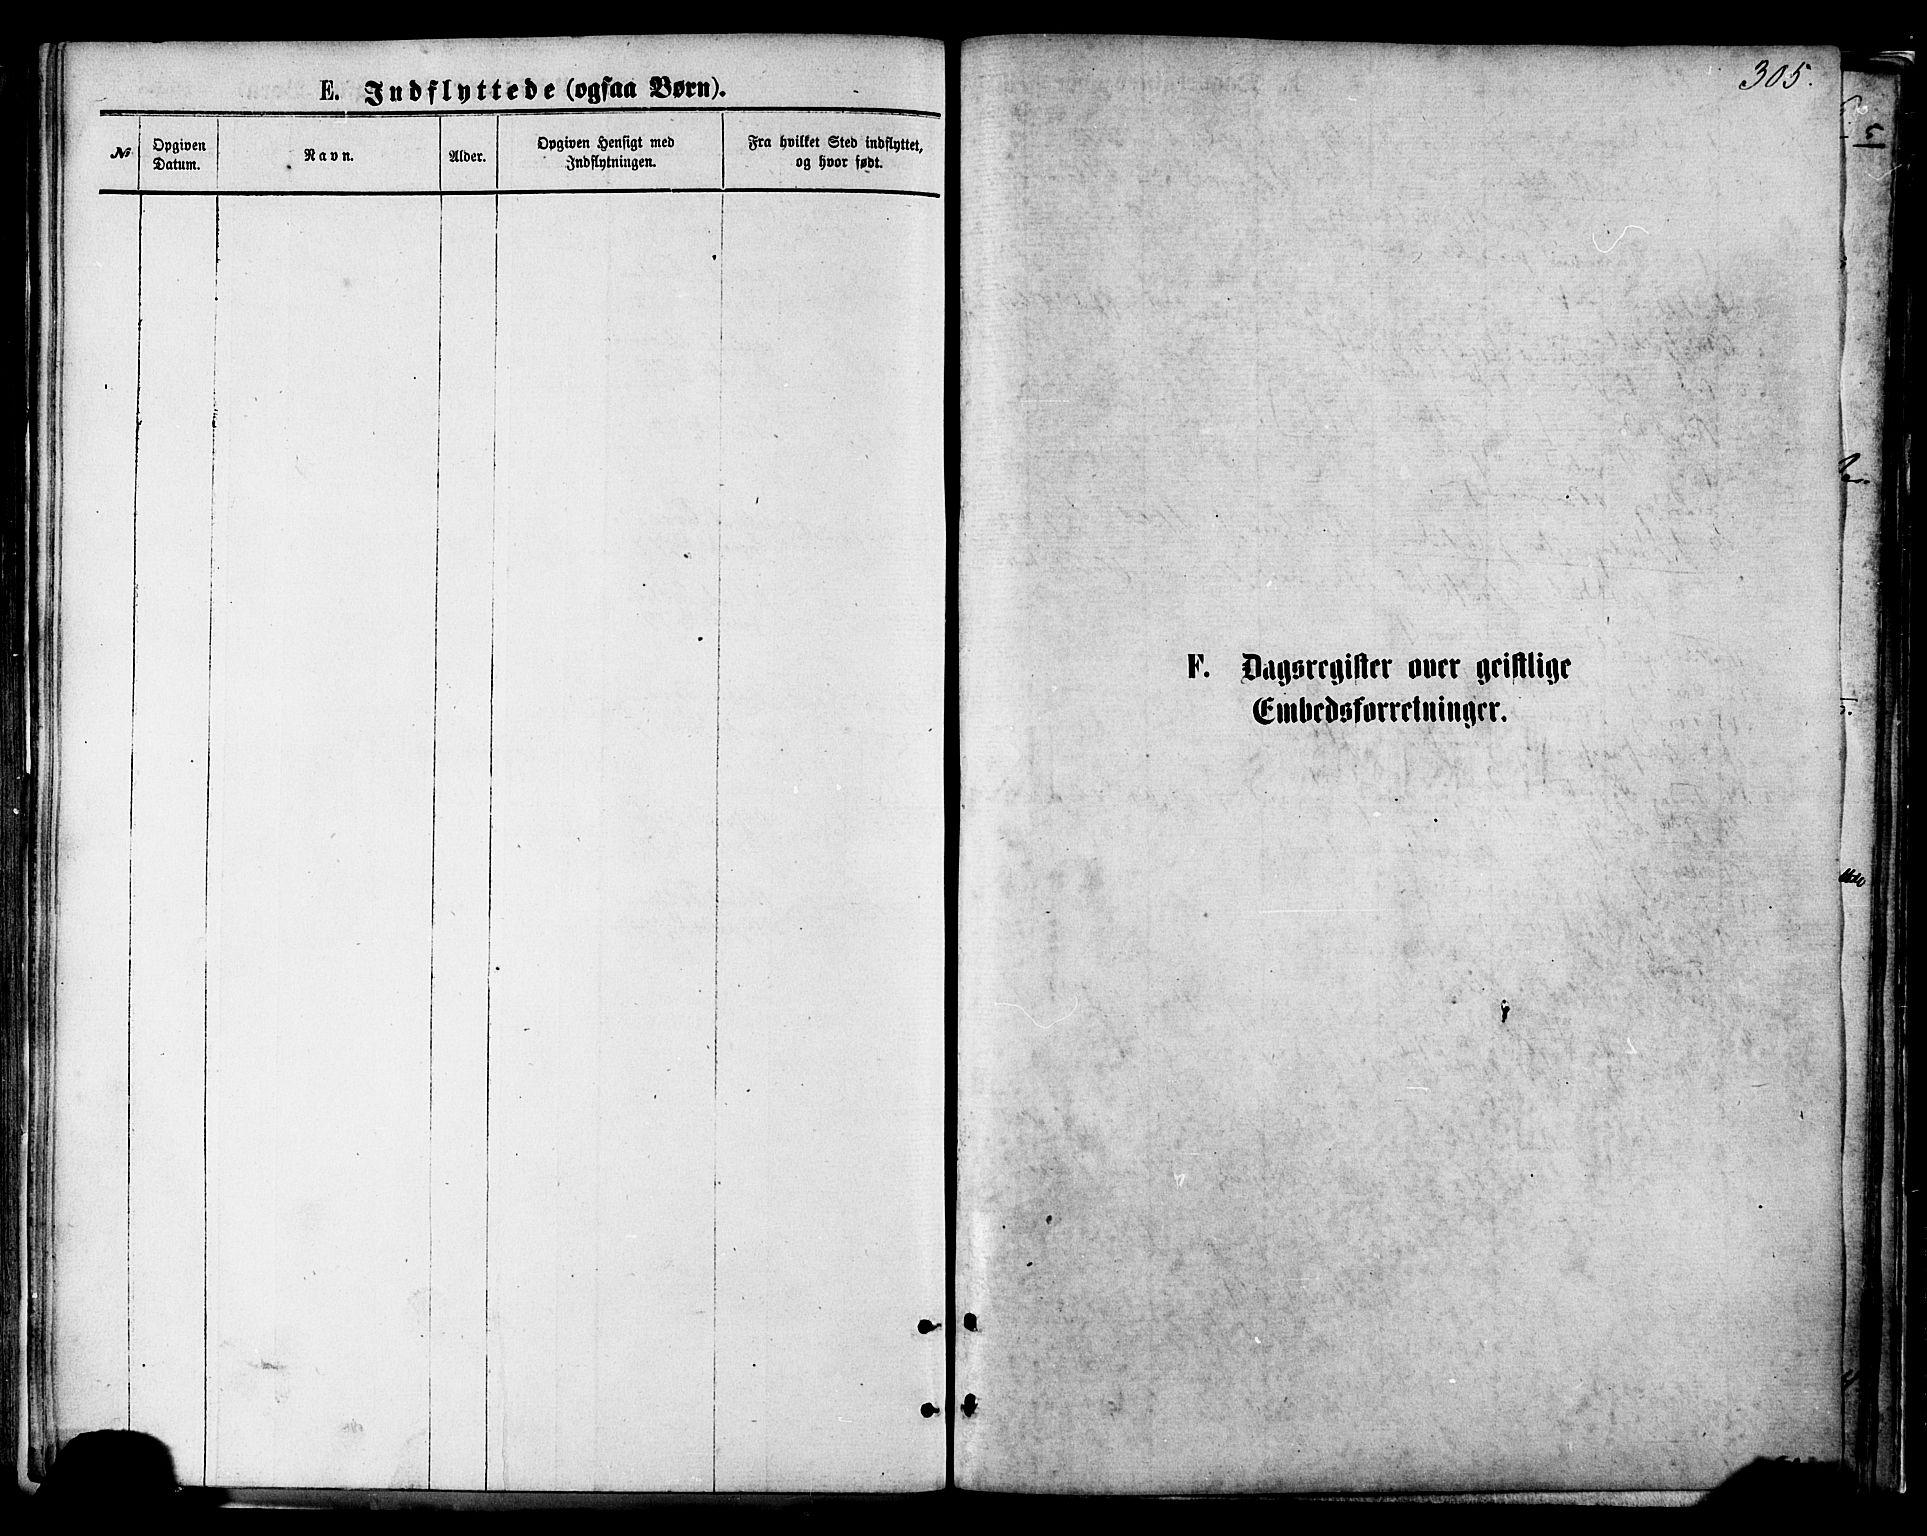 SAT, Ministerialprotokoller, klokkerbøker og fødselsregistre - Nordland, 801/L0009: Ministerialbok nr. 801A09, 1876-1883, s. 305